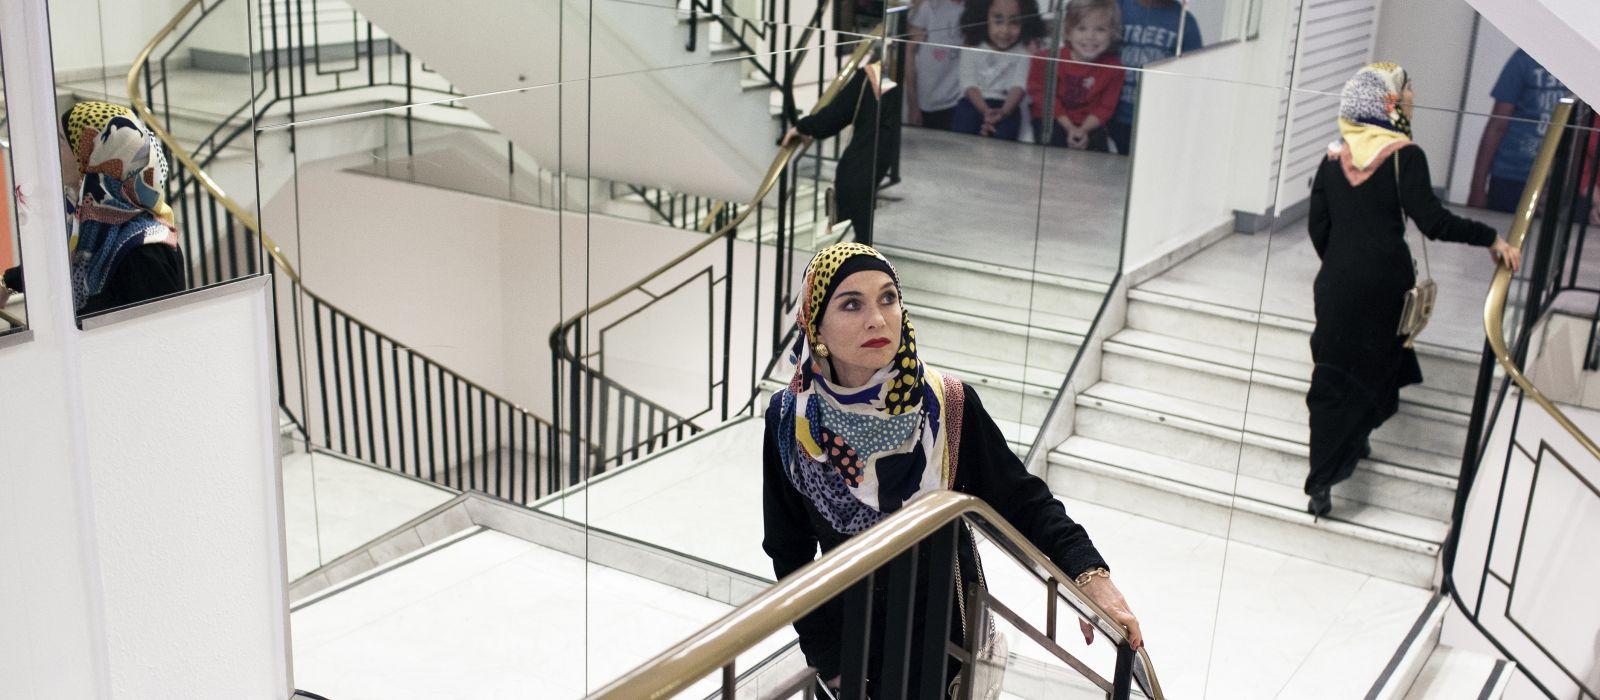 Mamá Maria, dirigida por Jean-Paul Salomé. BCN Film Fest 2021